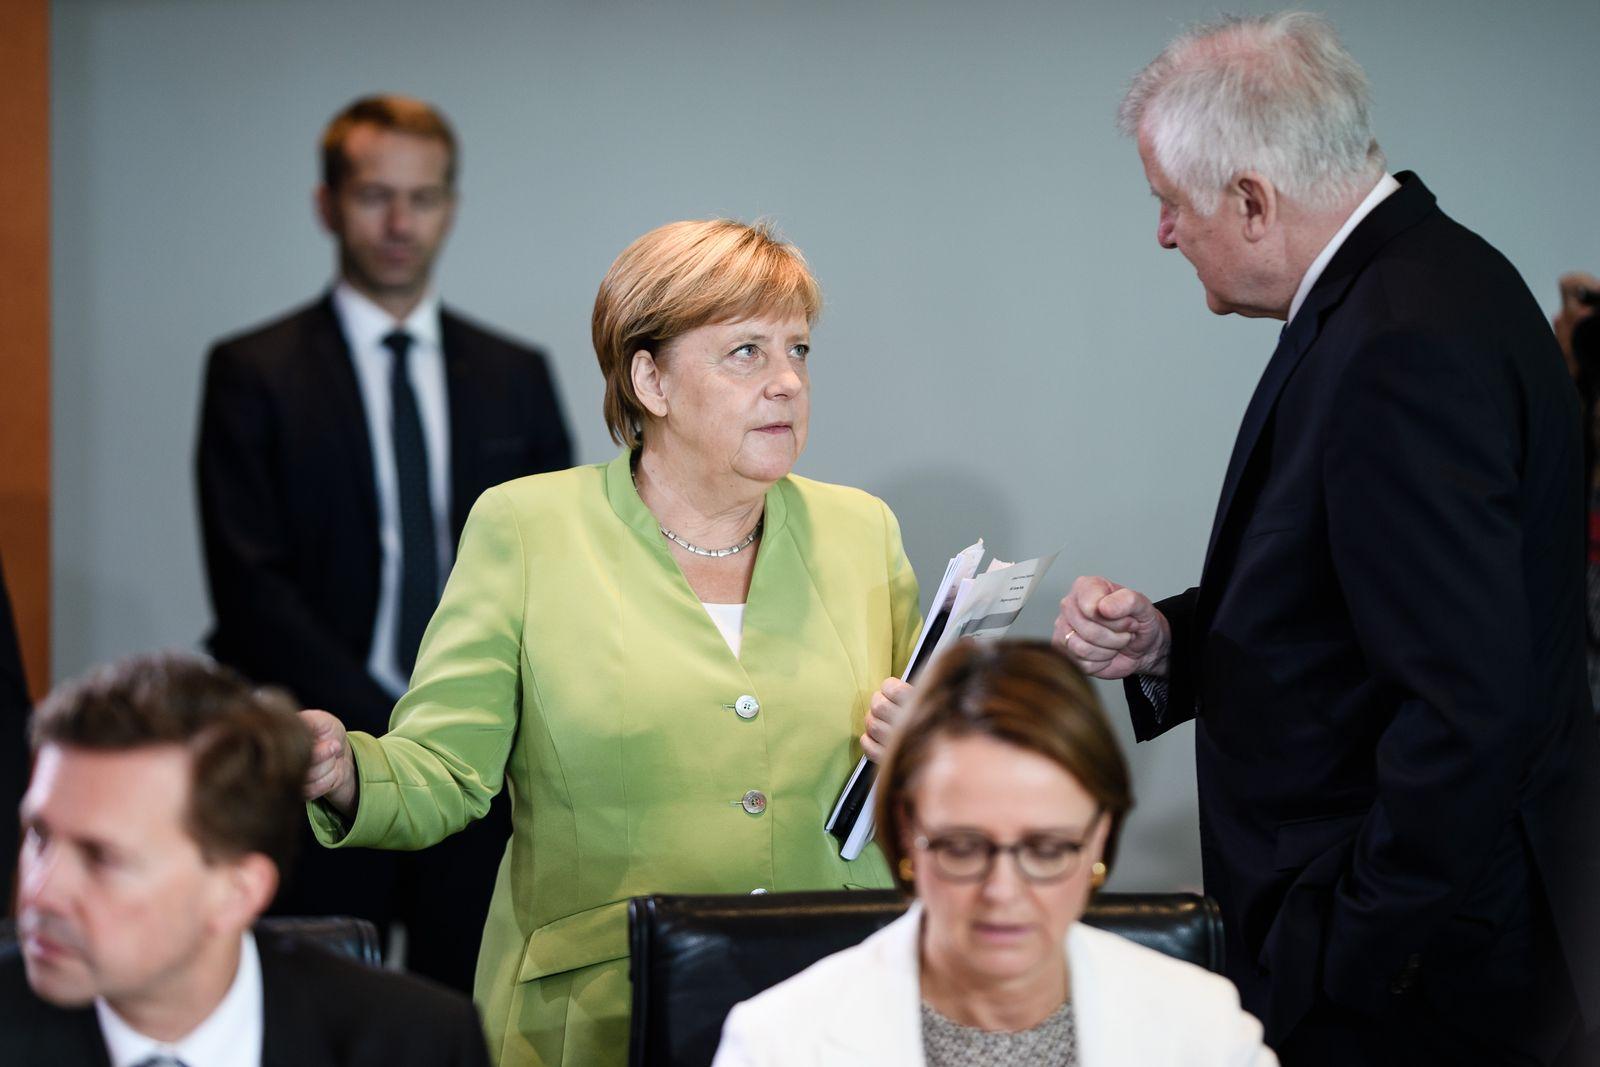 CSU/ CDU